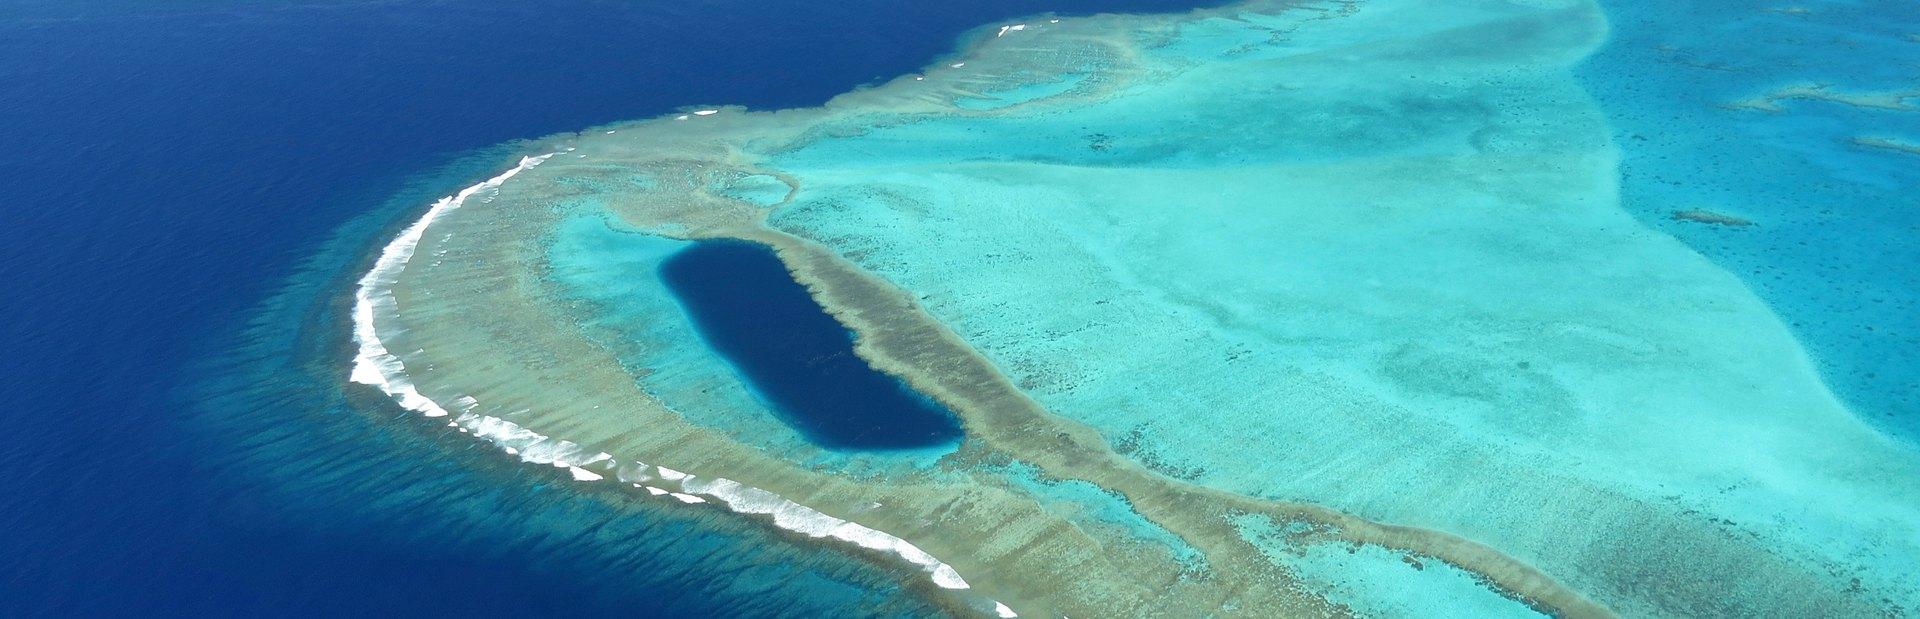 New Caledonia interactive map